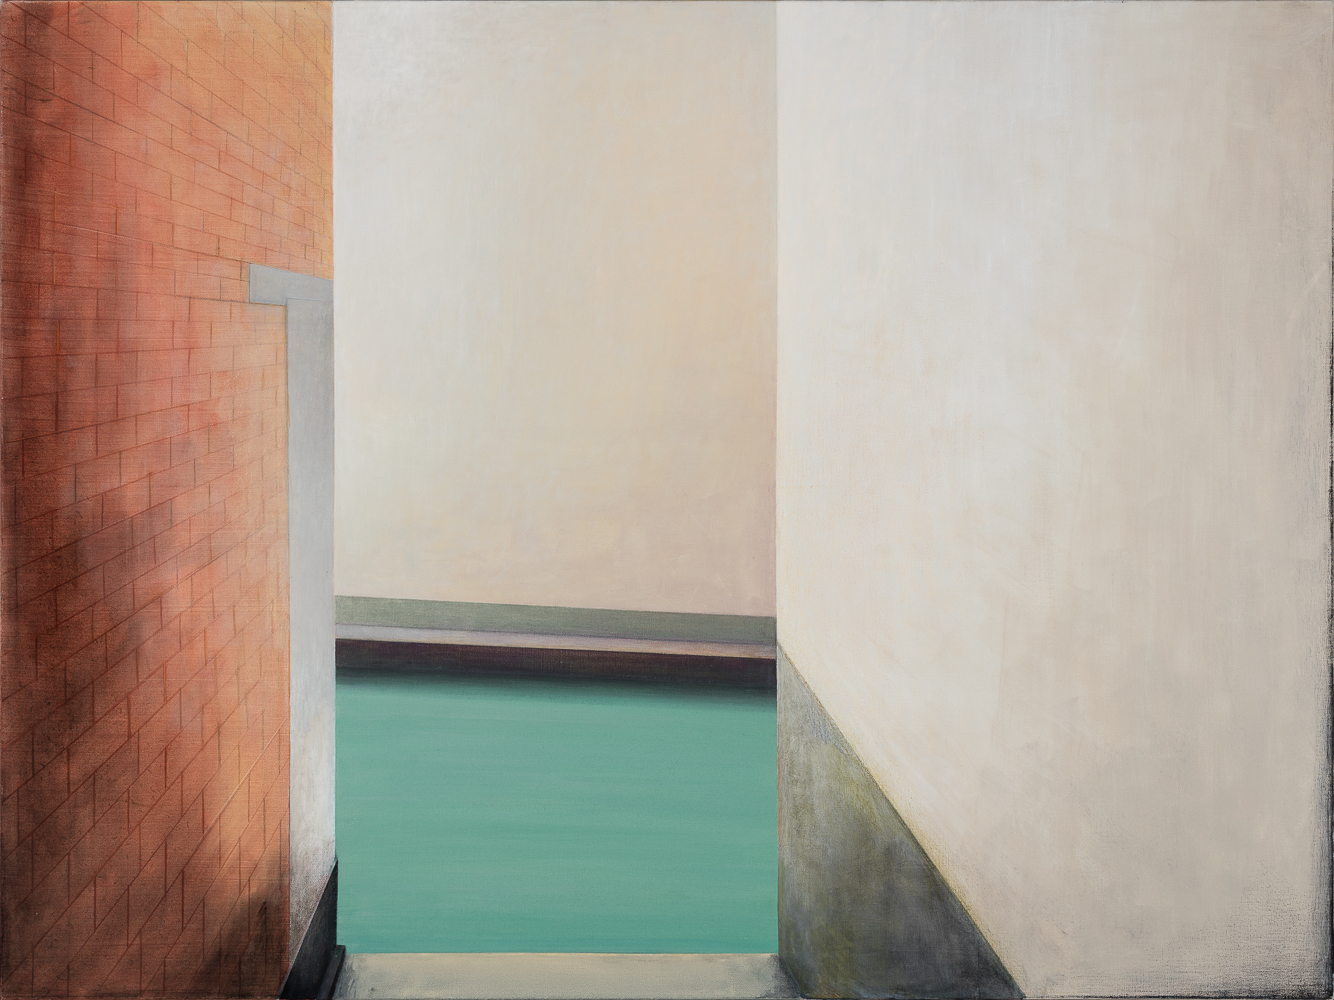 Eduard Angeli_Wienerroither & Kohlbacher_Kunst-Dokumentation.com_web_001.jpg